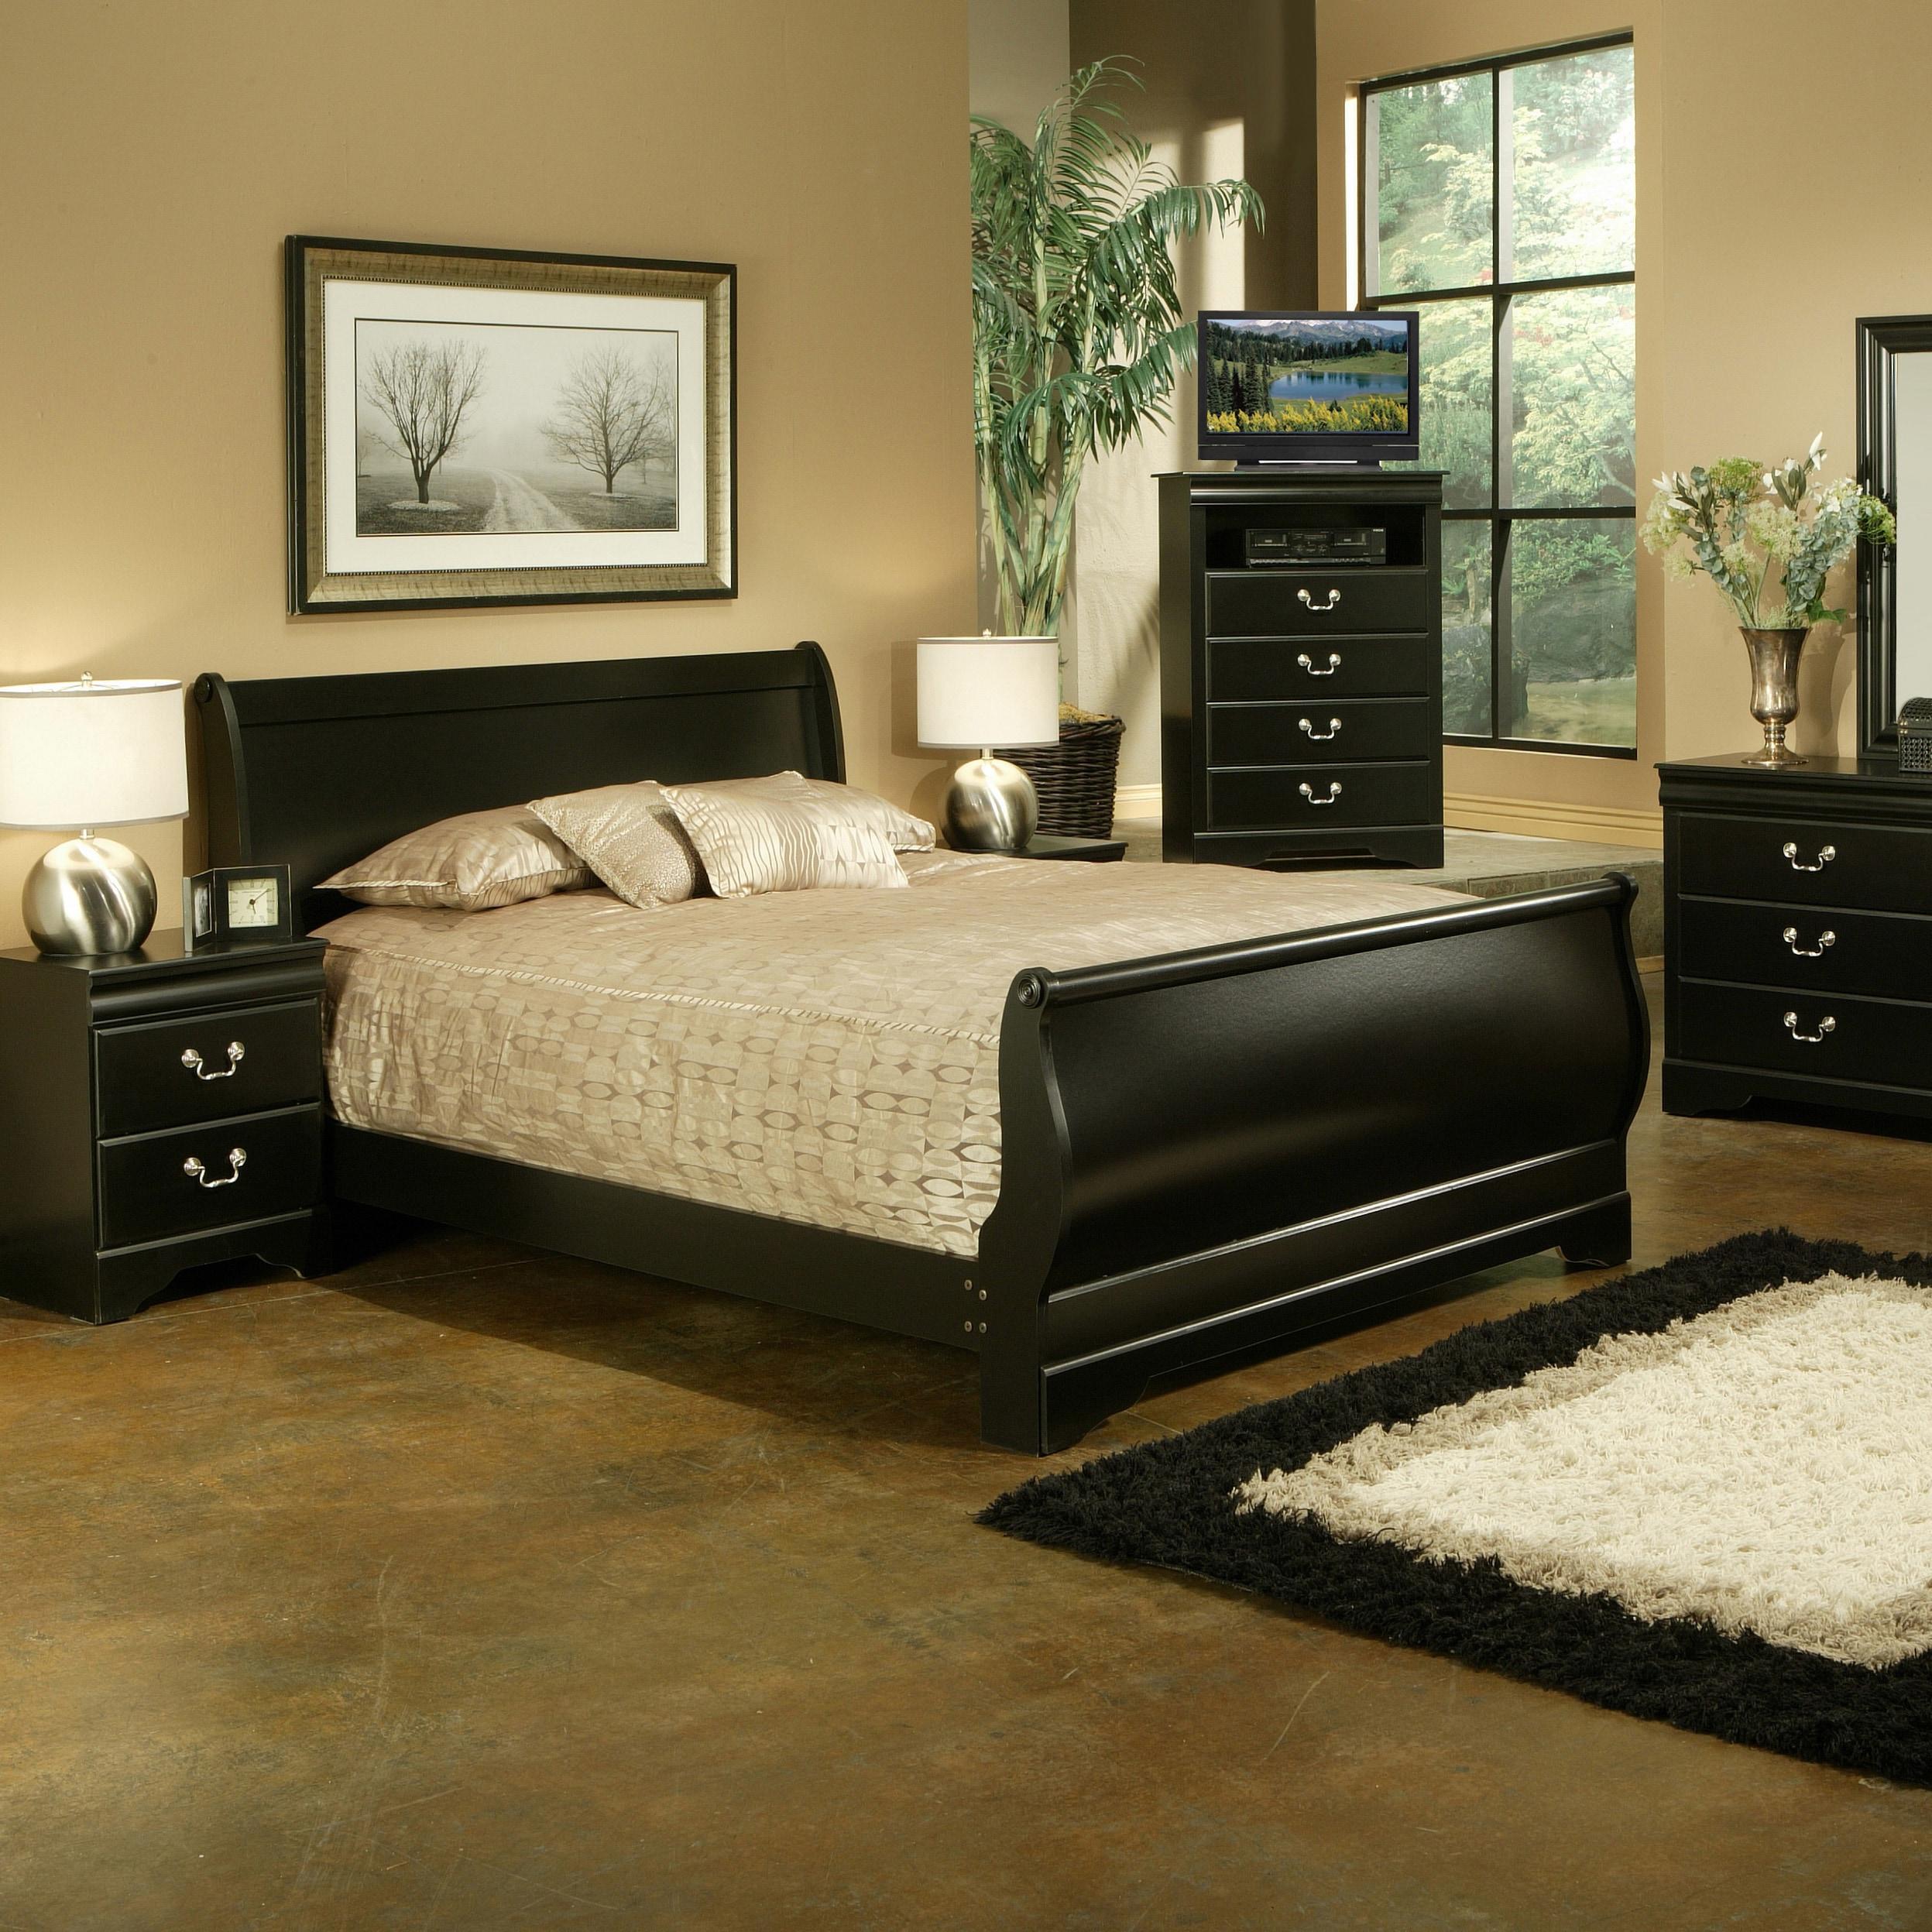 Sandberg Furniture Regency Traditional Black Sleigh Bed (...